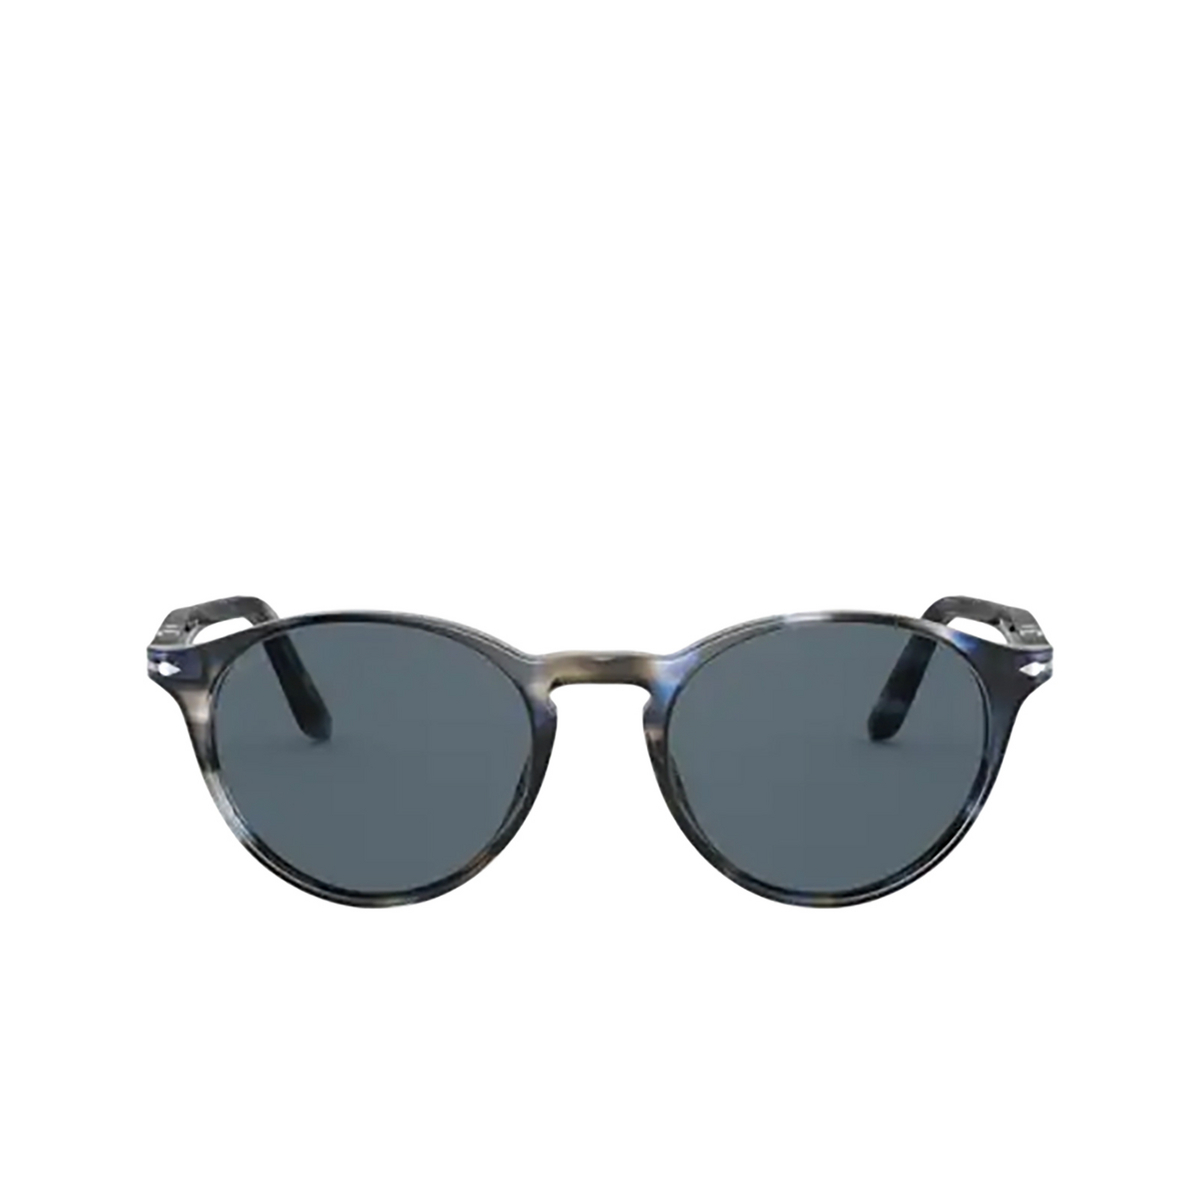 Persol® Round Sunglasses: PO3092SM color Striped Blue & Grey 1126R5 - front view.